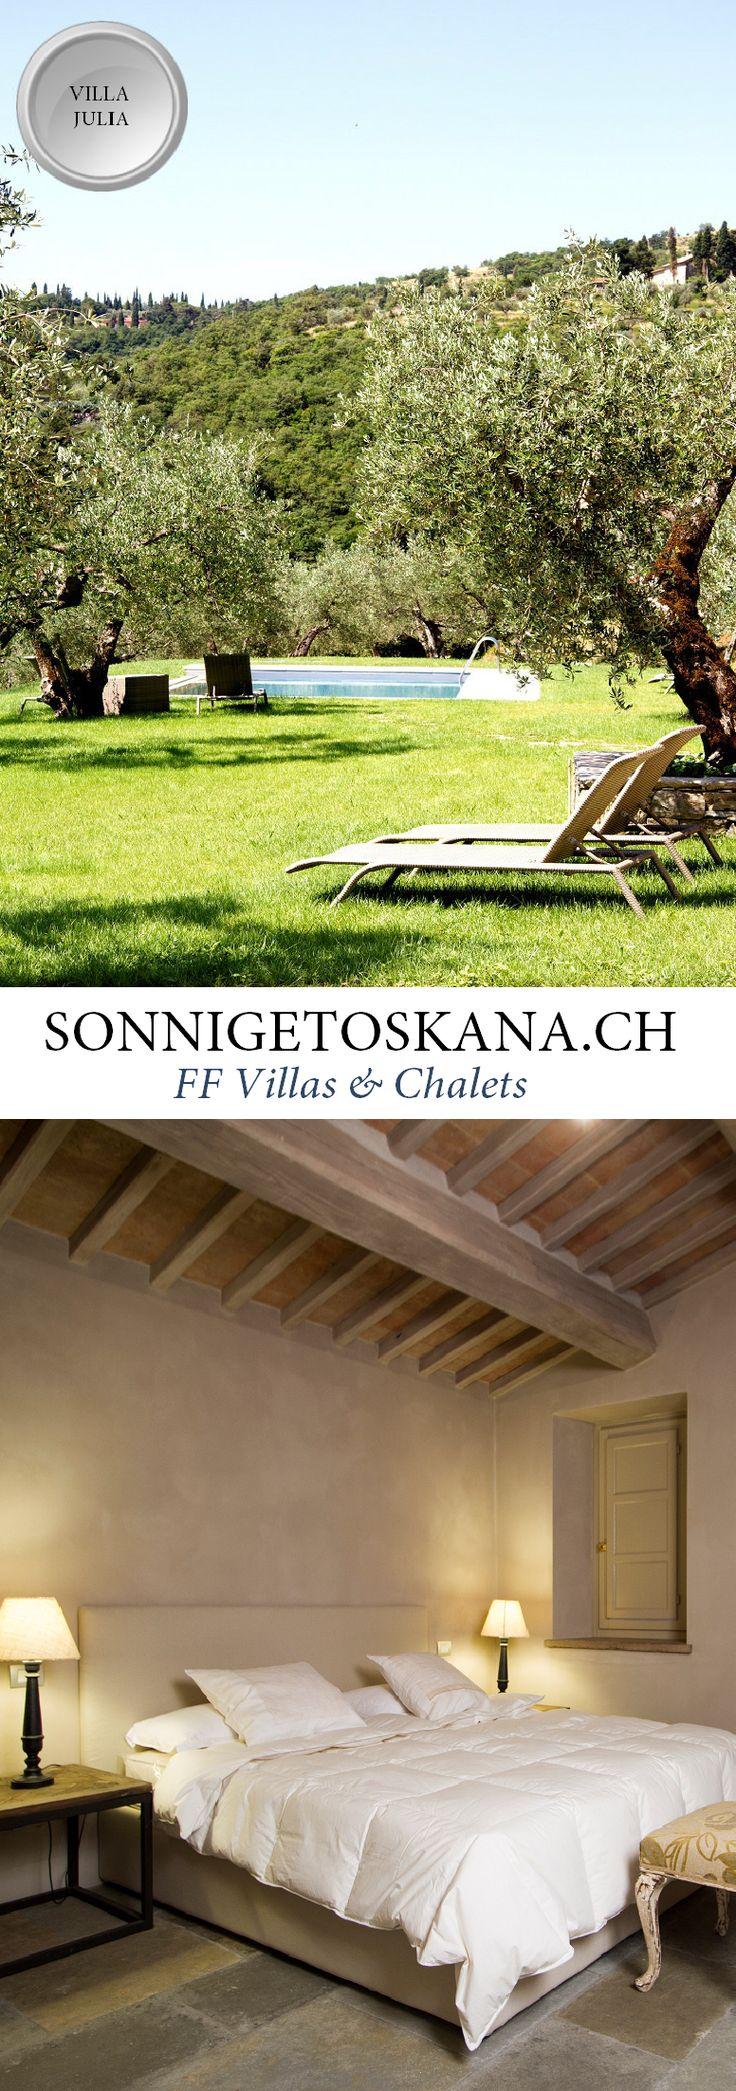 Ferienhaus Ferienvilla Villa Julia || www.sonnigetoskana.ch || Italien - Toskana || 2 Schlafzimmer…